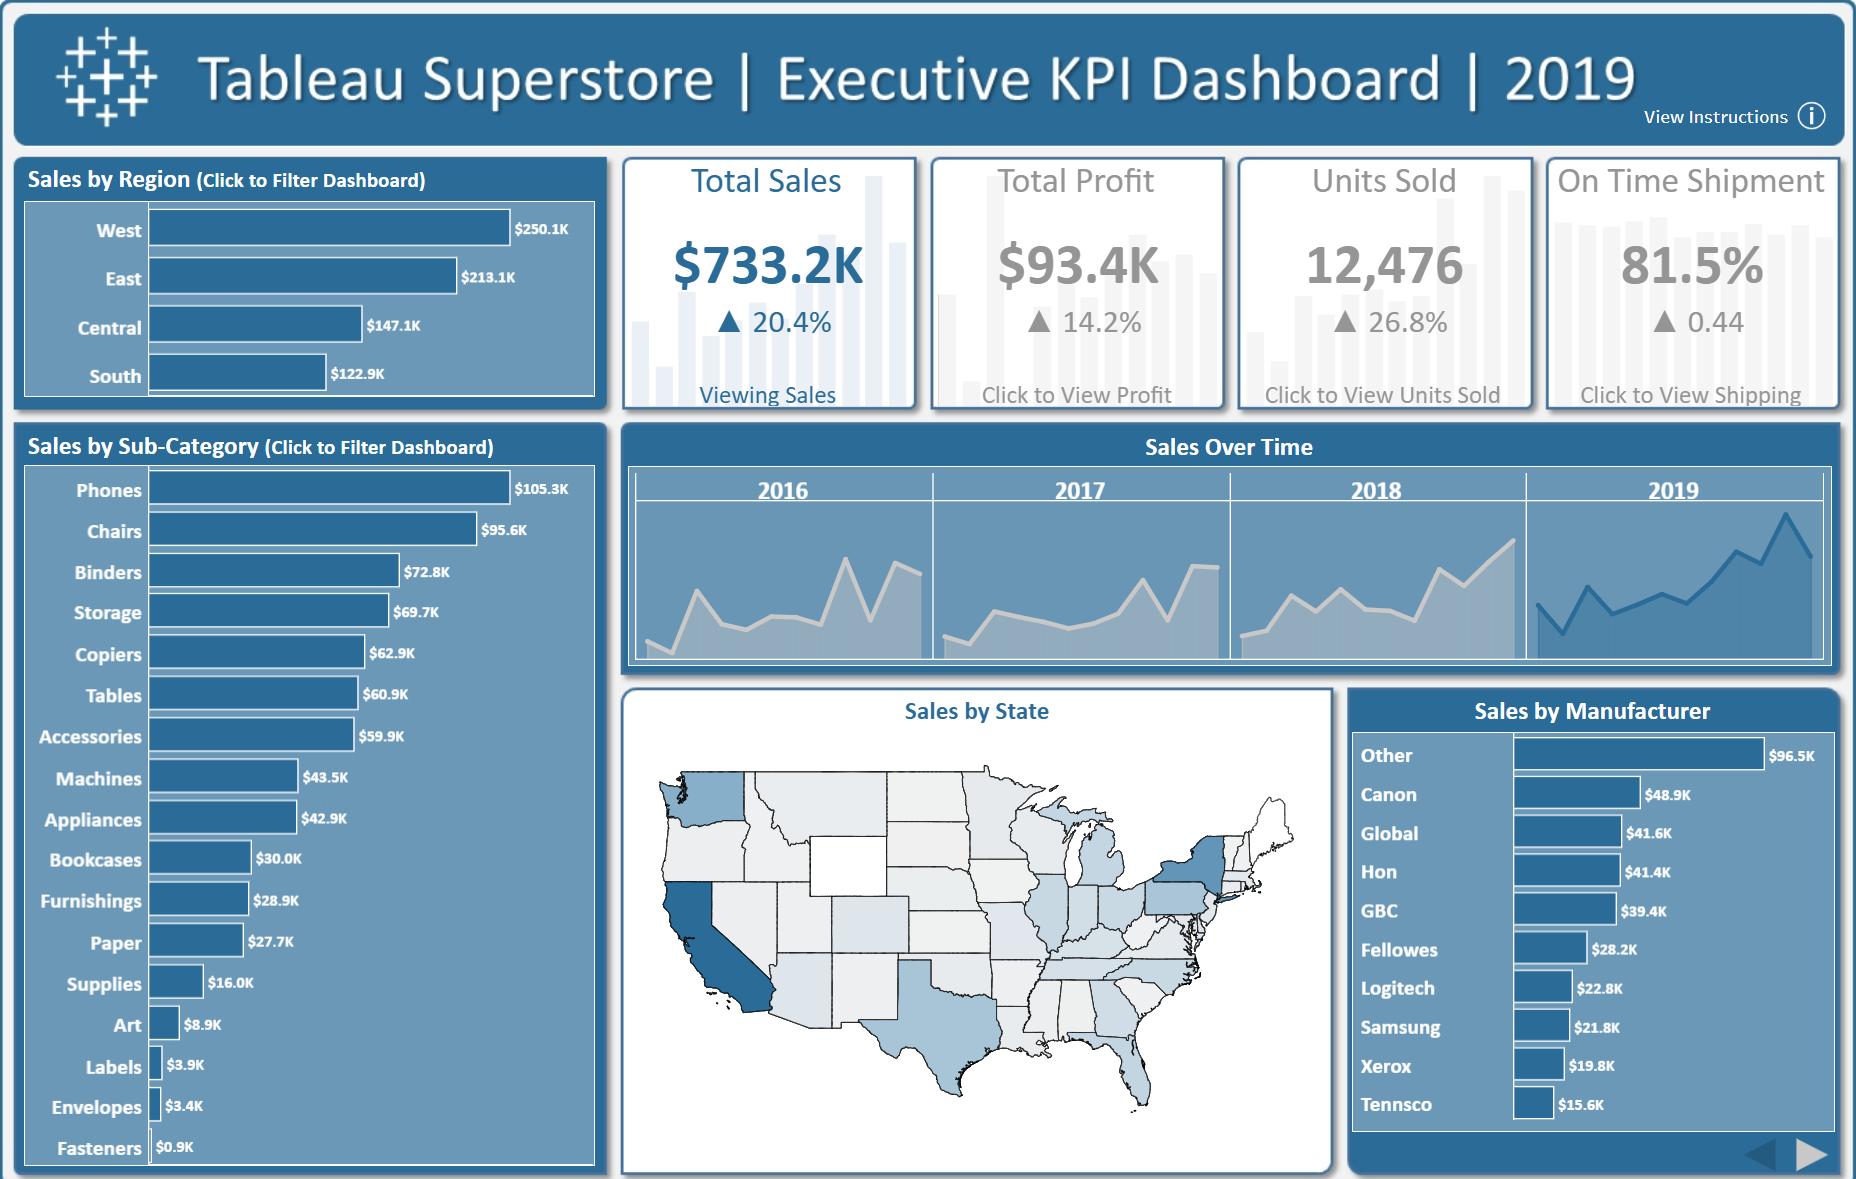 Executive KPI Dashboard